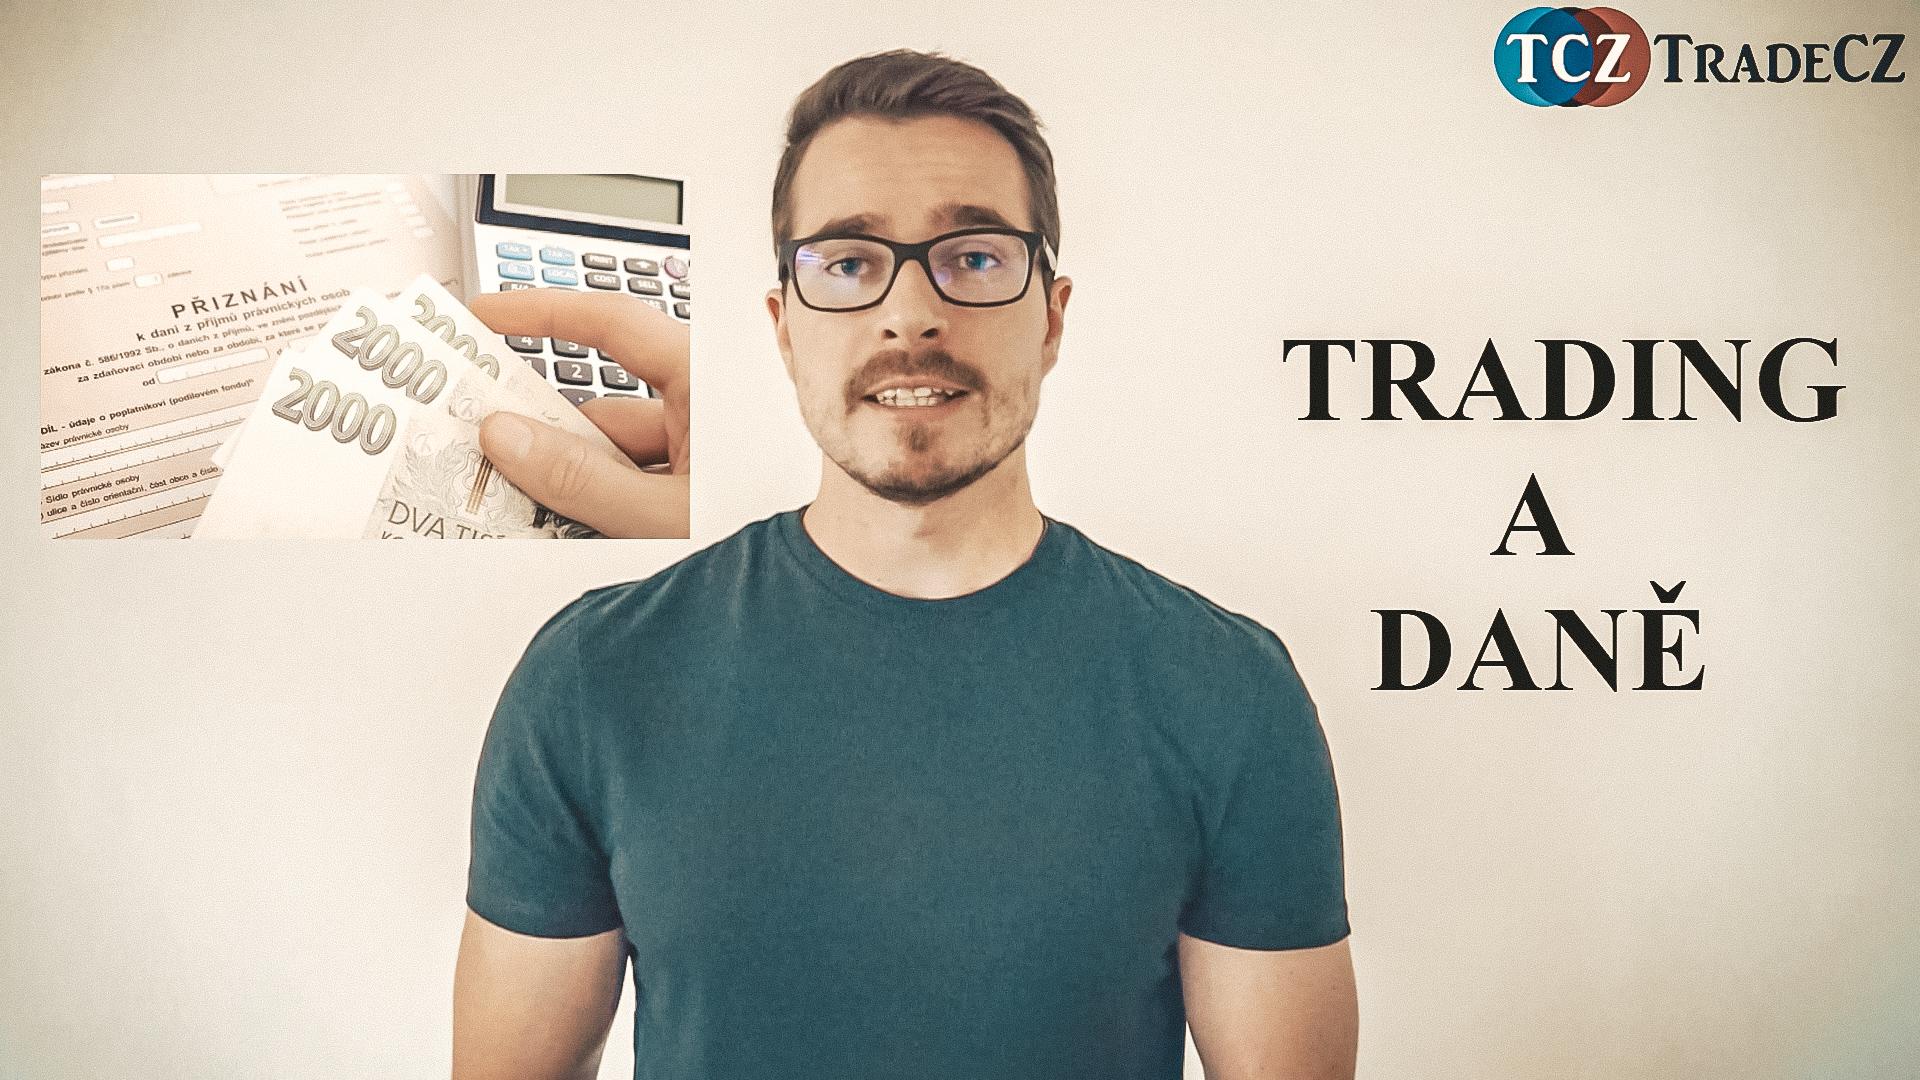 Trading a daně